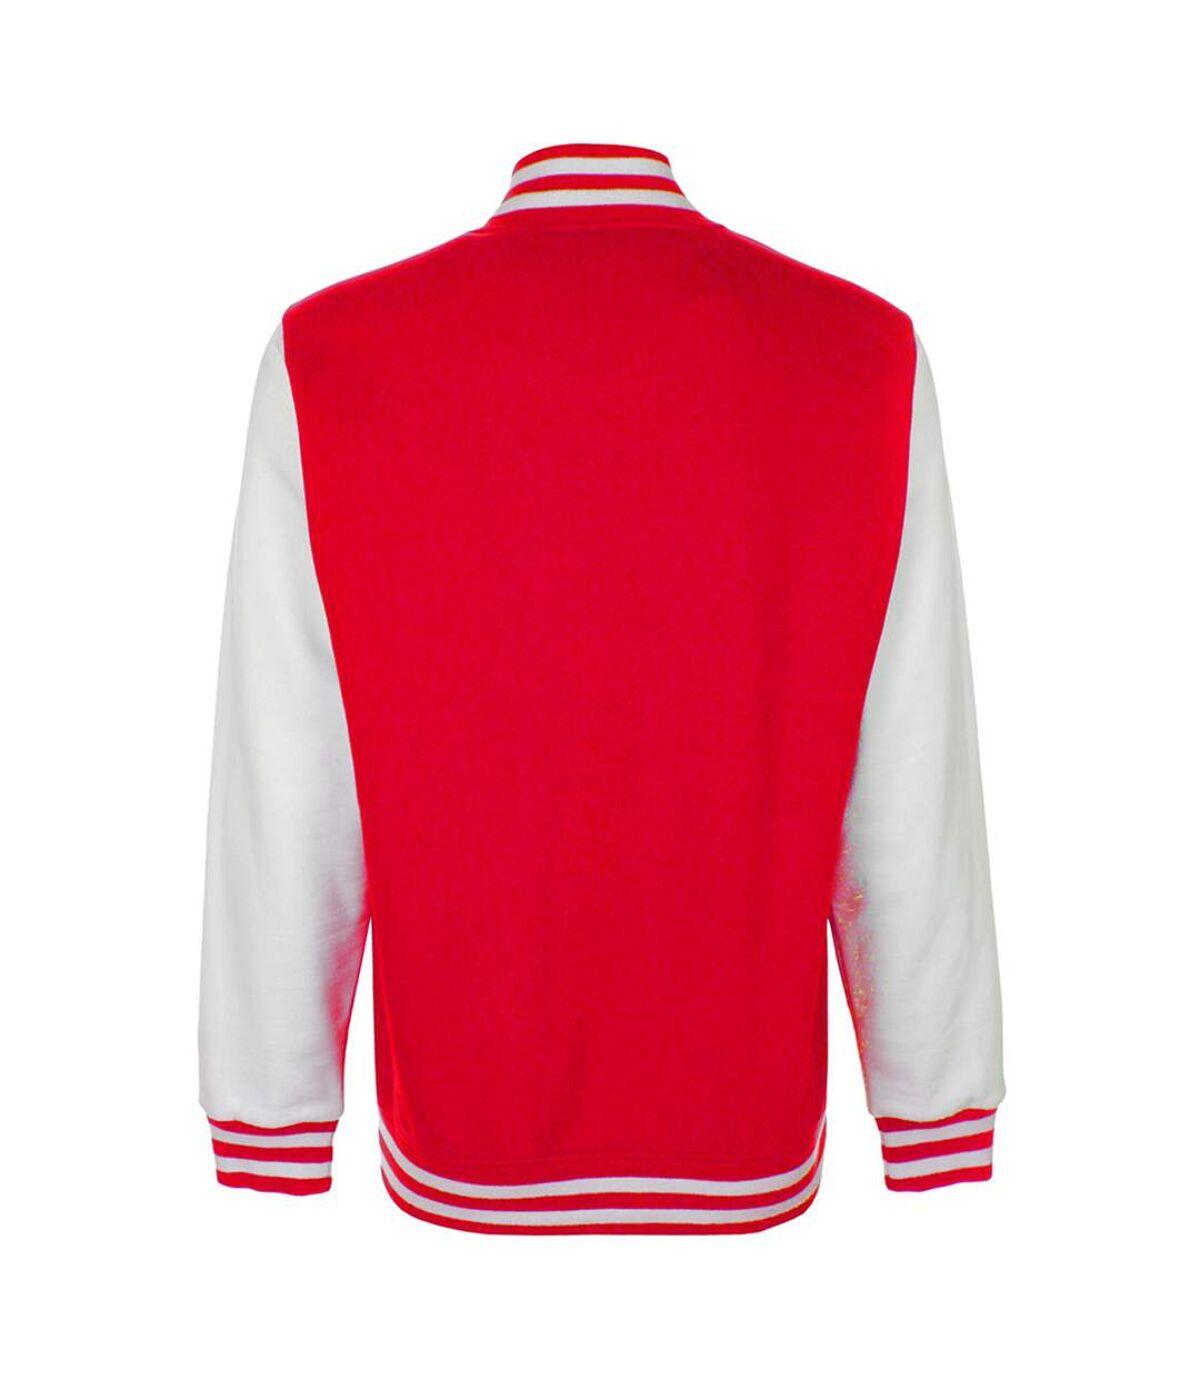 FDM Unisex Varsity / University Jacket (Contrast Sleeves) (Navy/Heather Grey) - UTBC2029